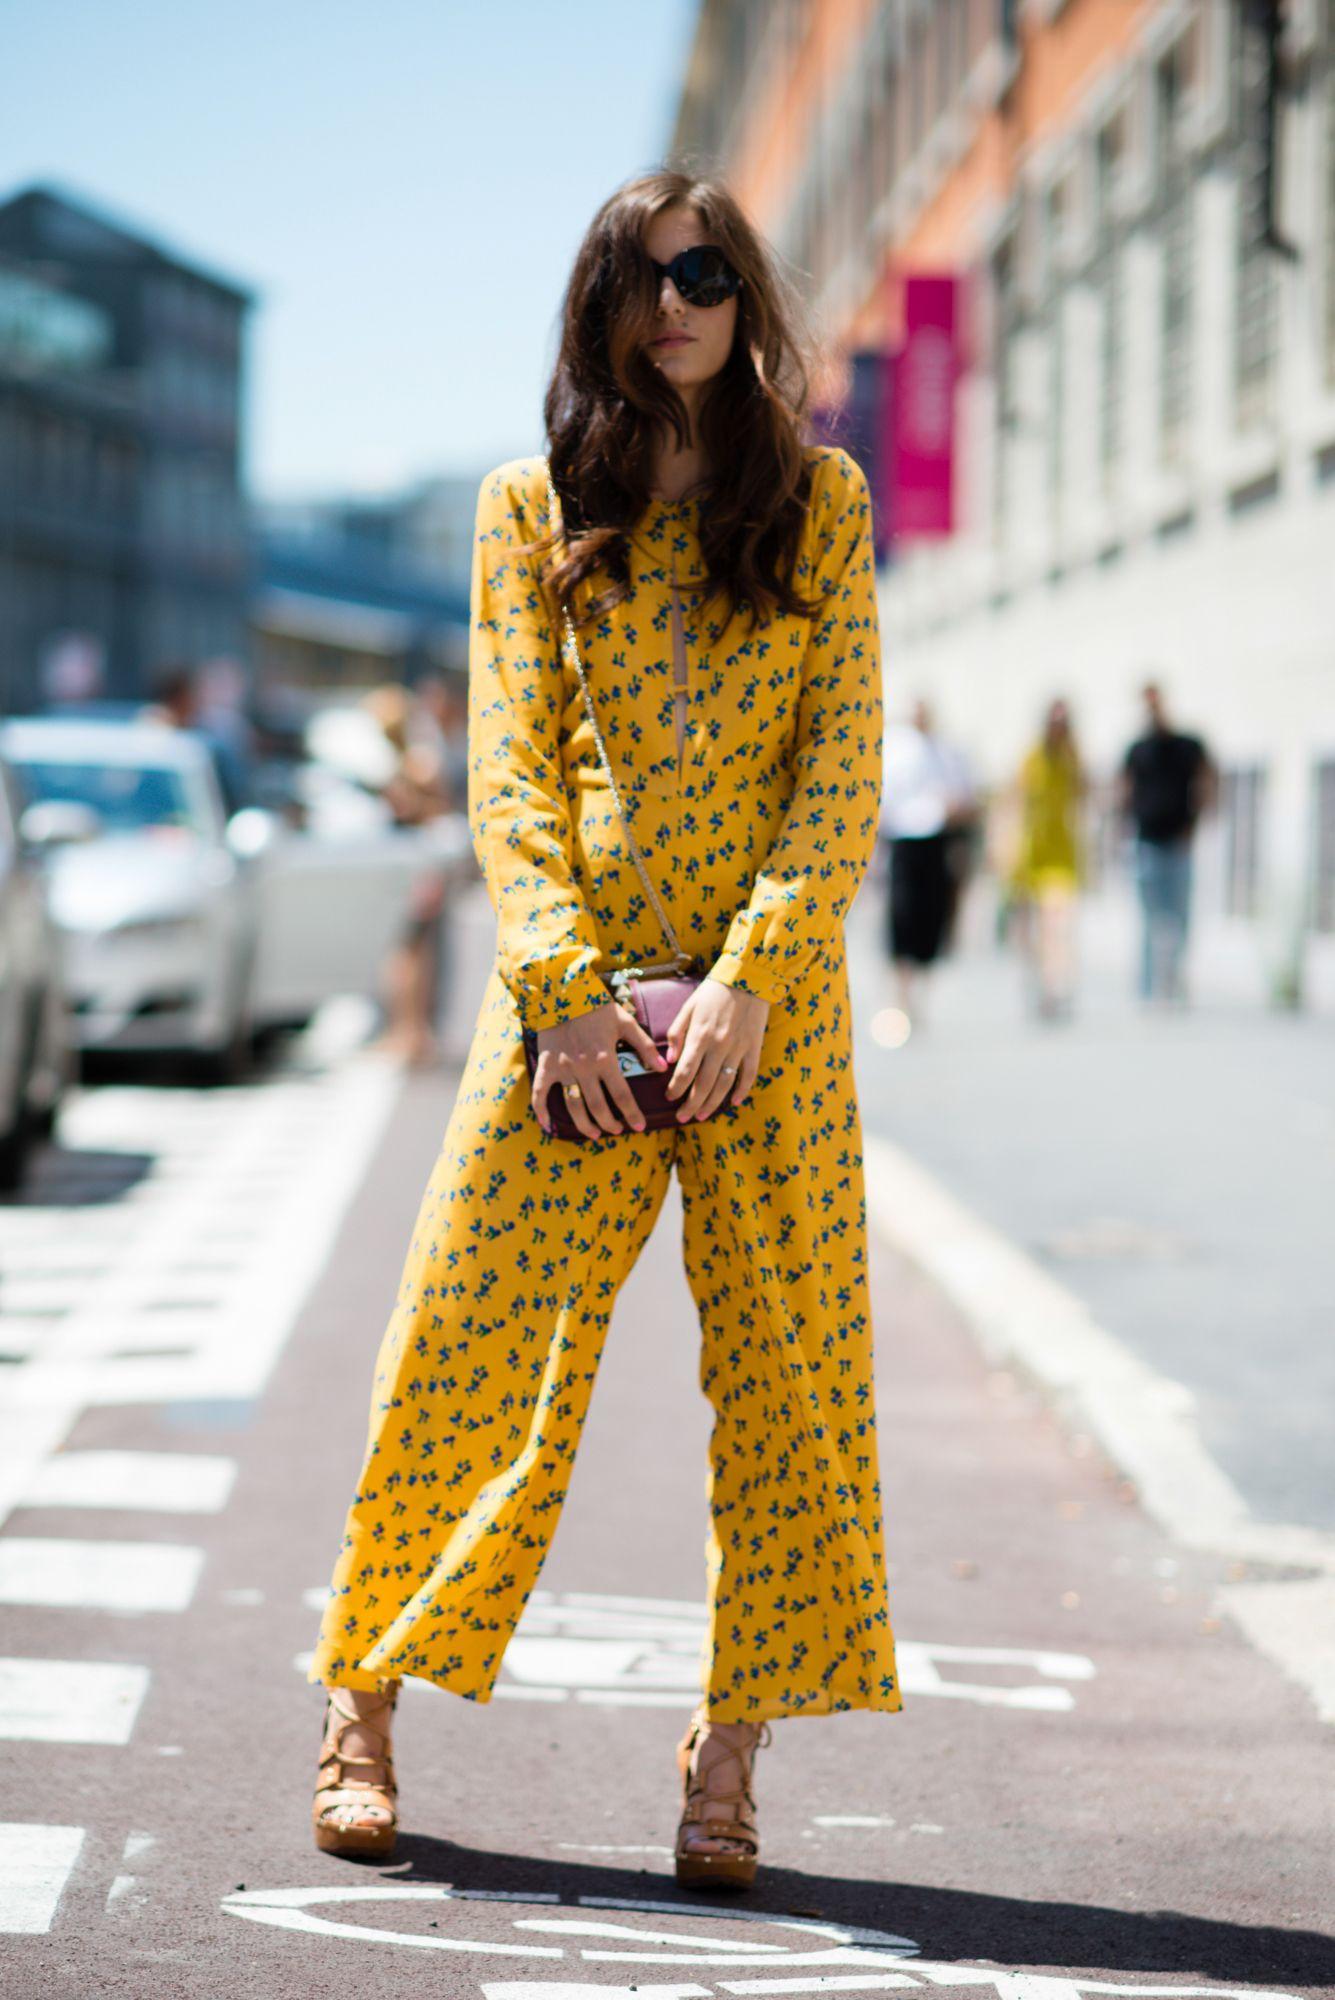 Eleonora Carisi  photo by Carola De Armas joujouvilleroy » How to style 70's #streetstyle #70s #annisettanta